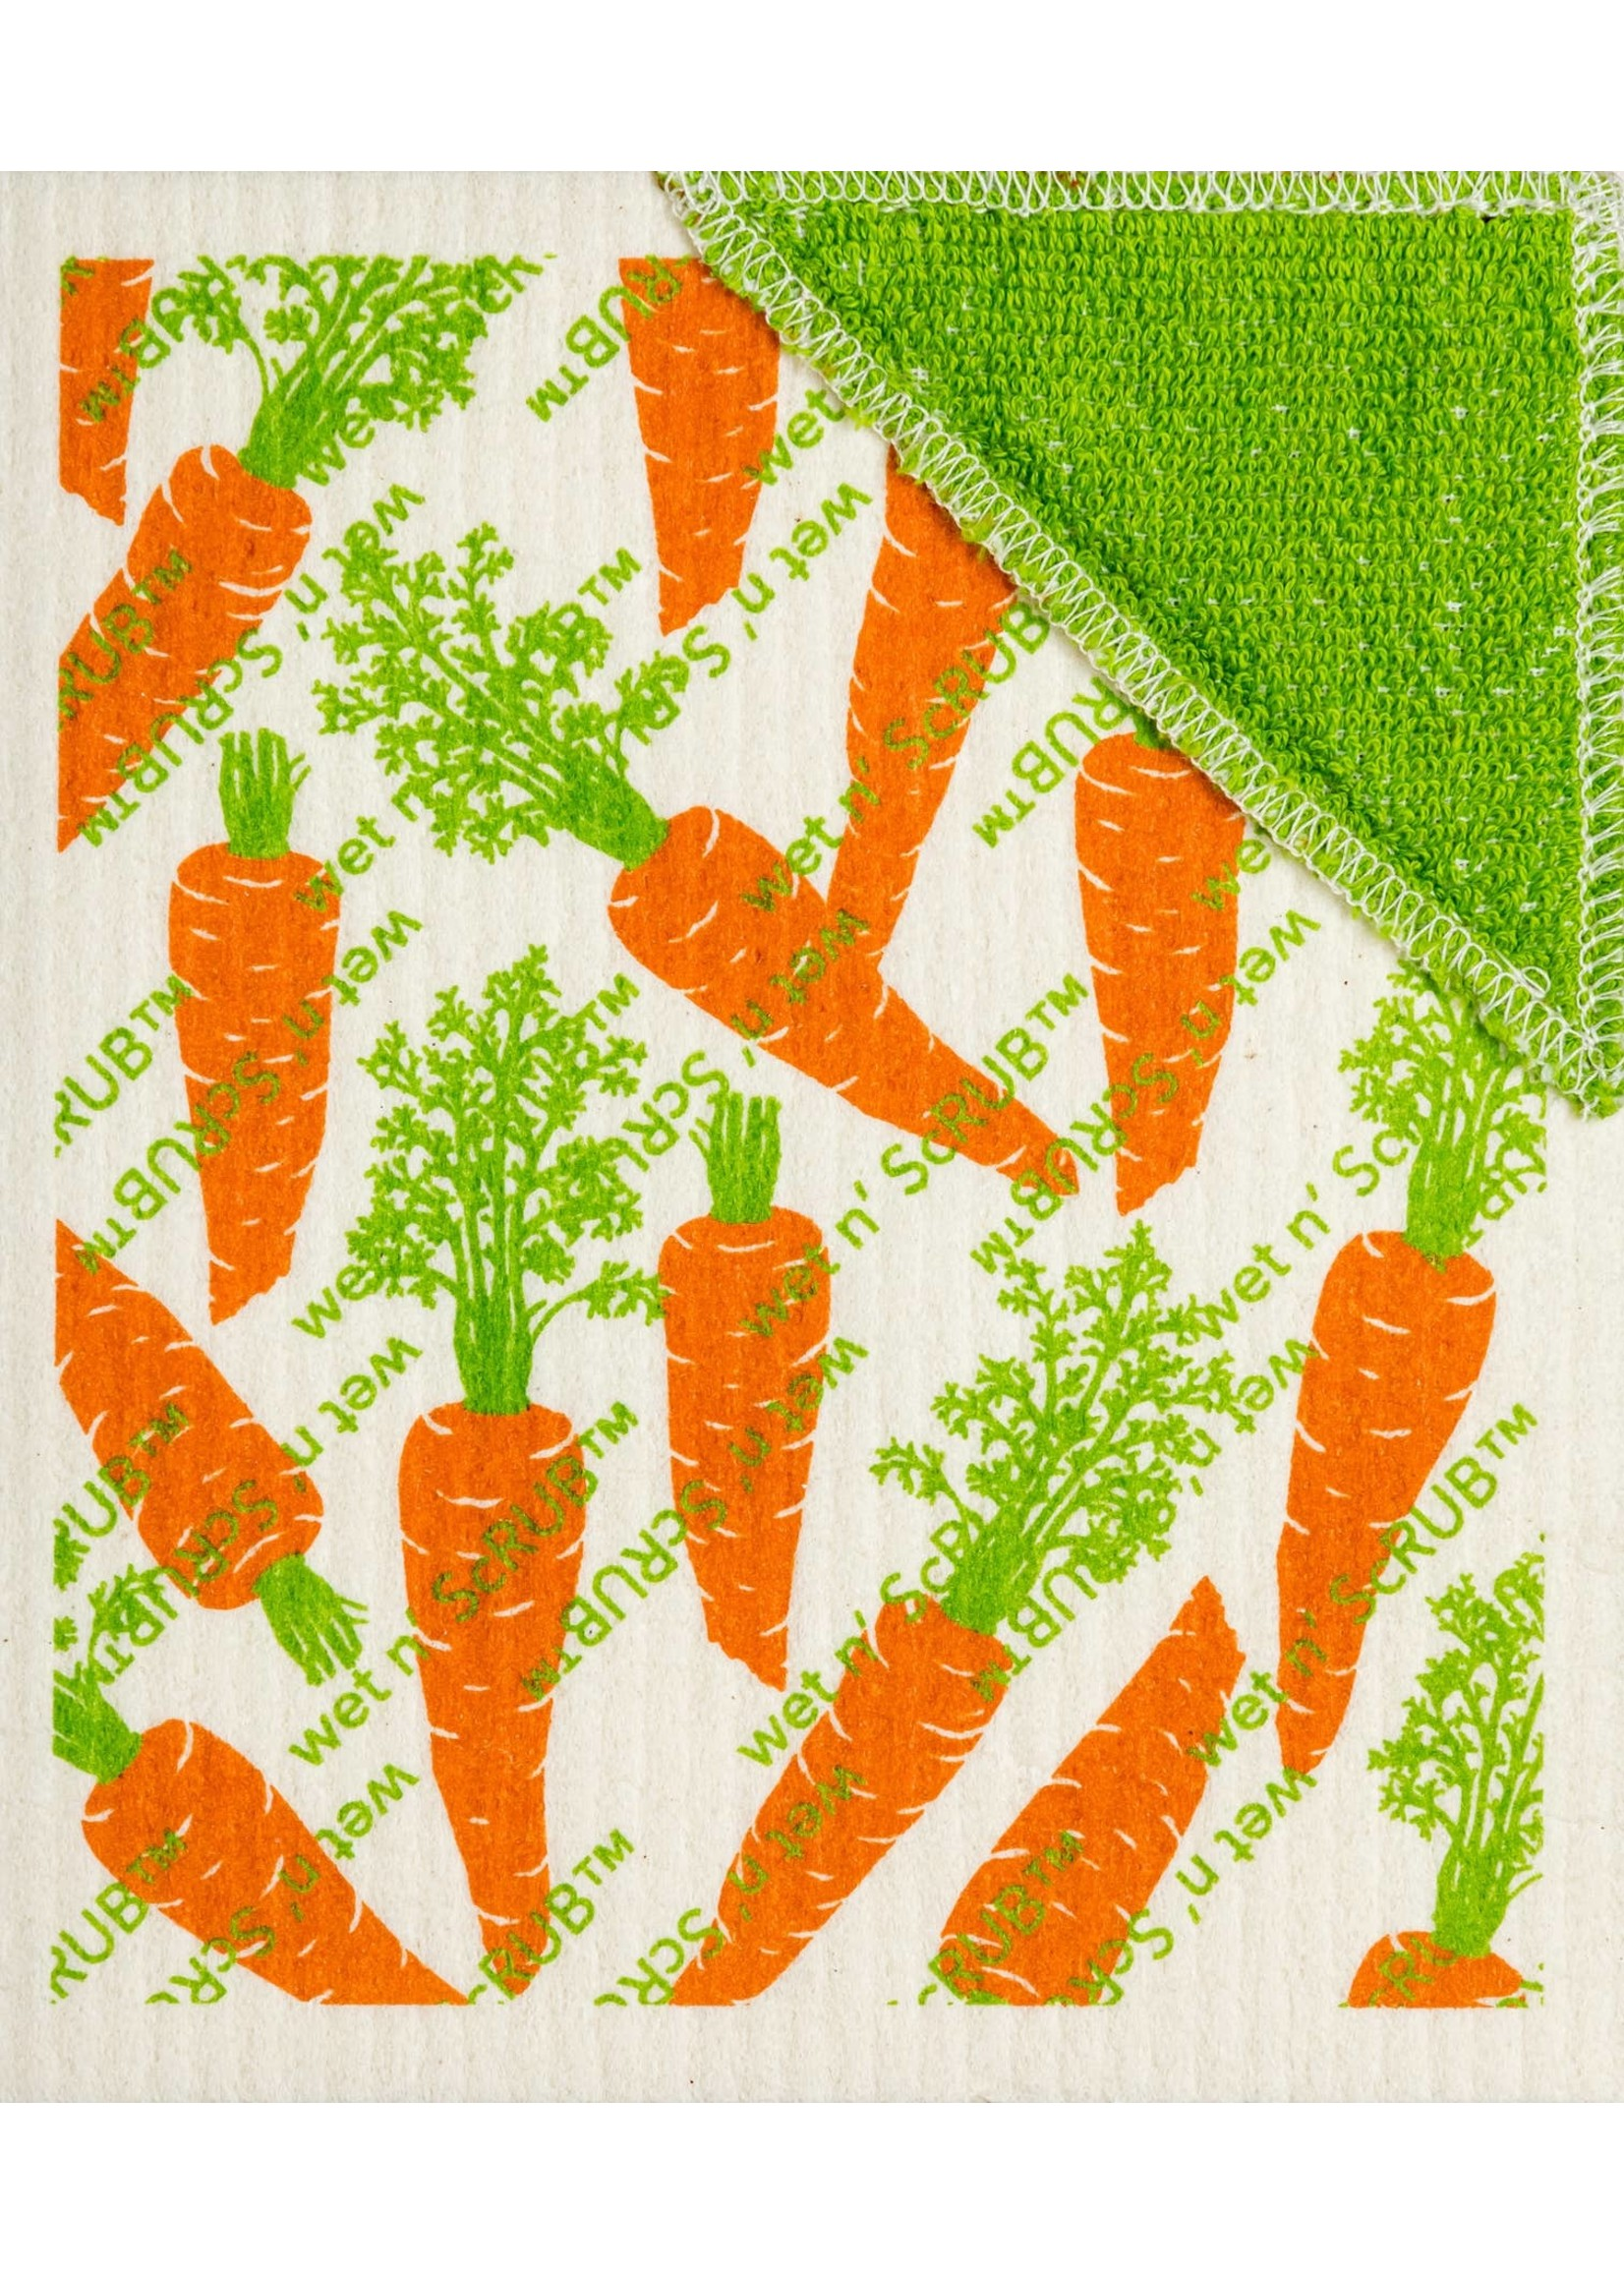 Carrots by Row Wet & ScRUB